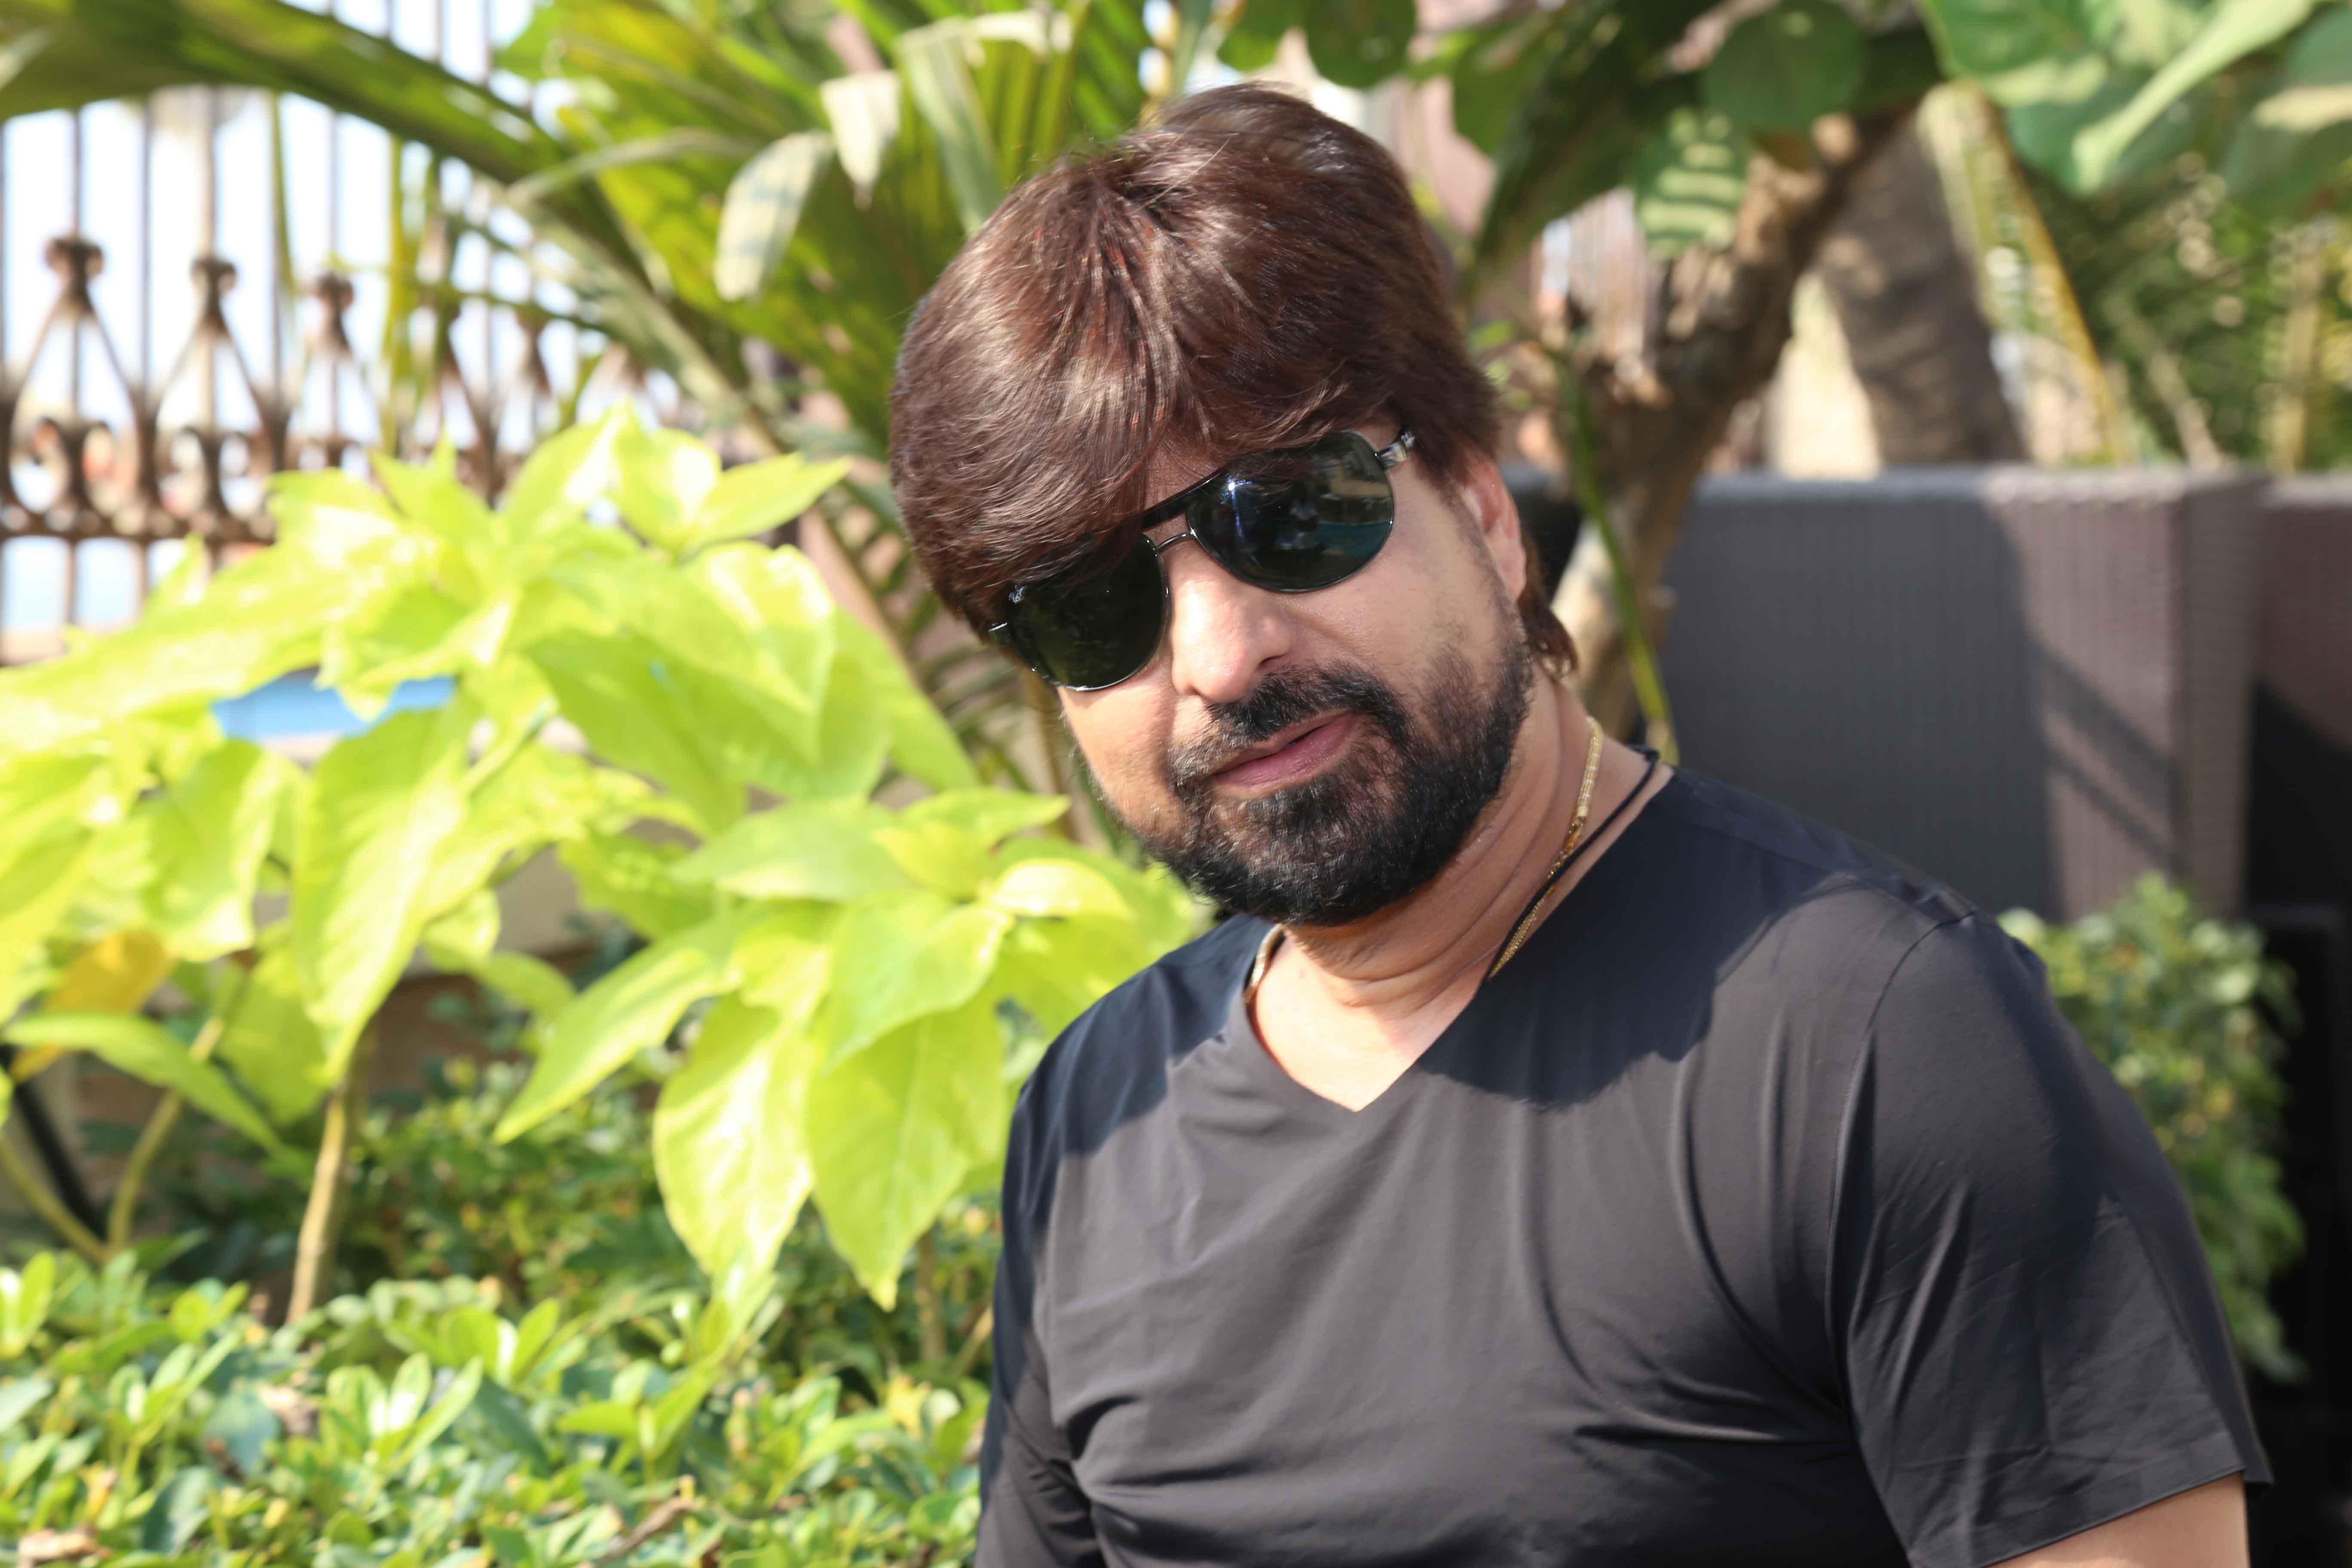 Vijay Valbhani